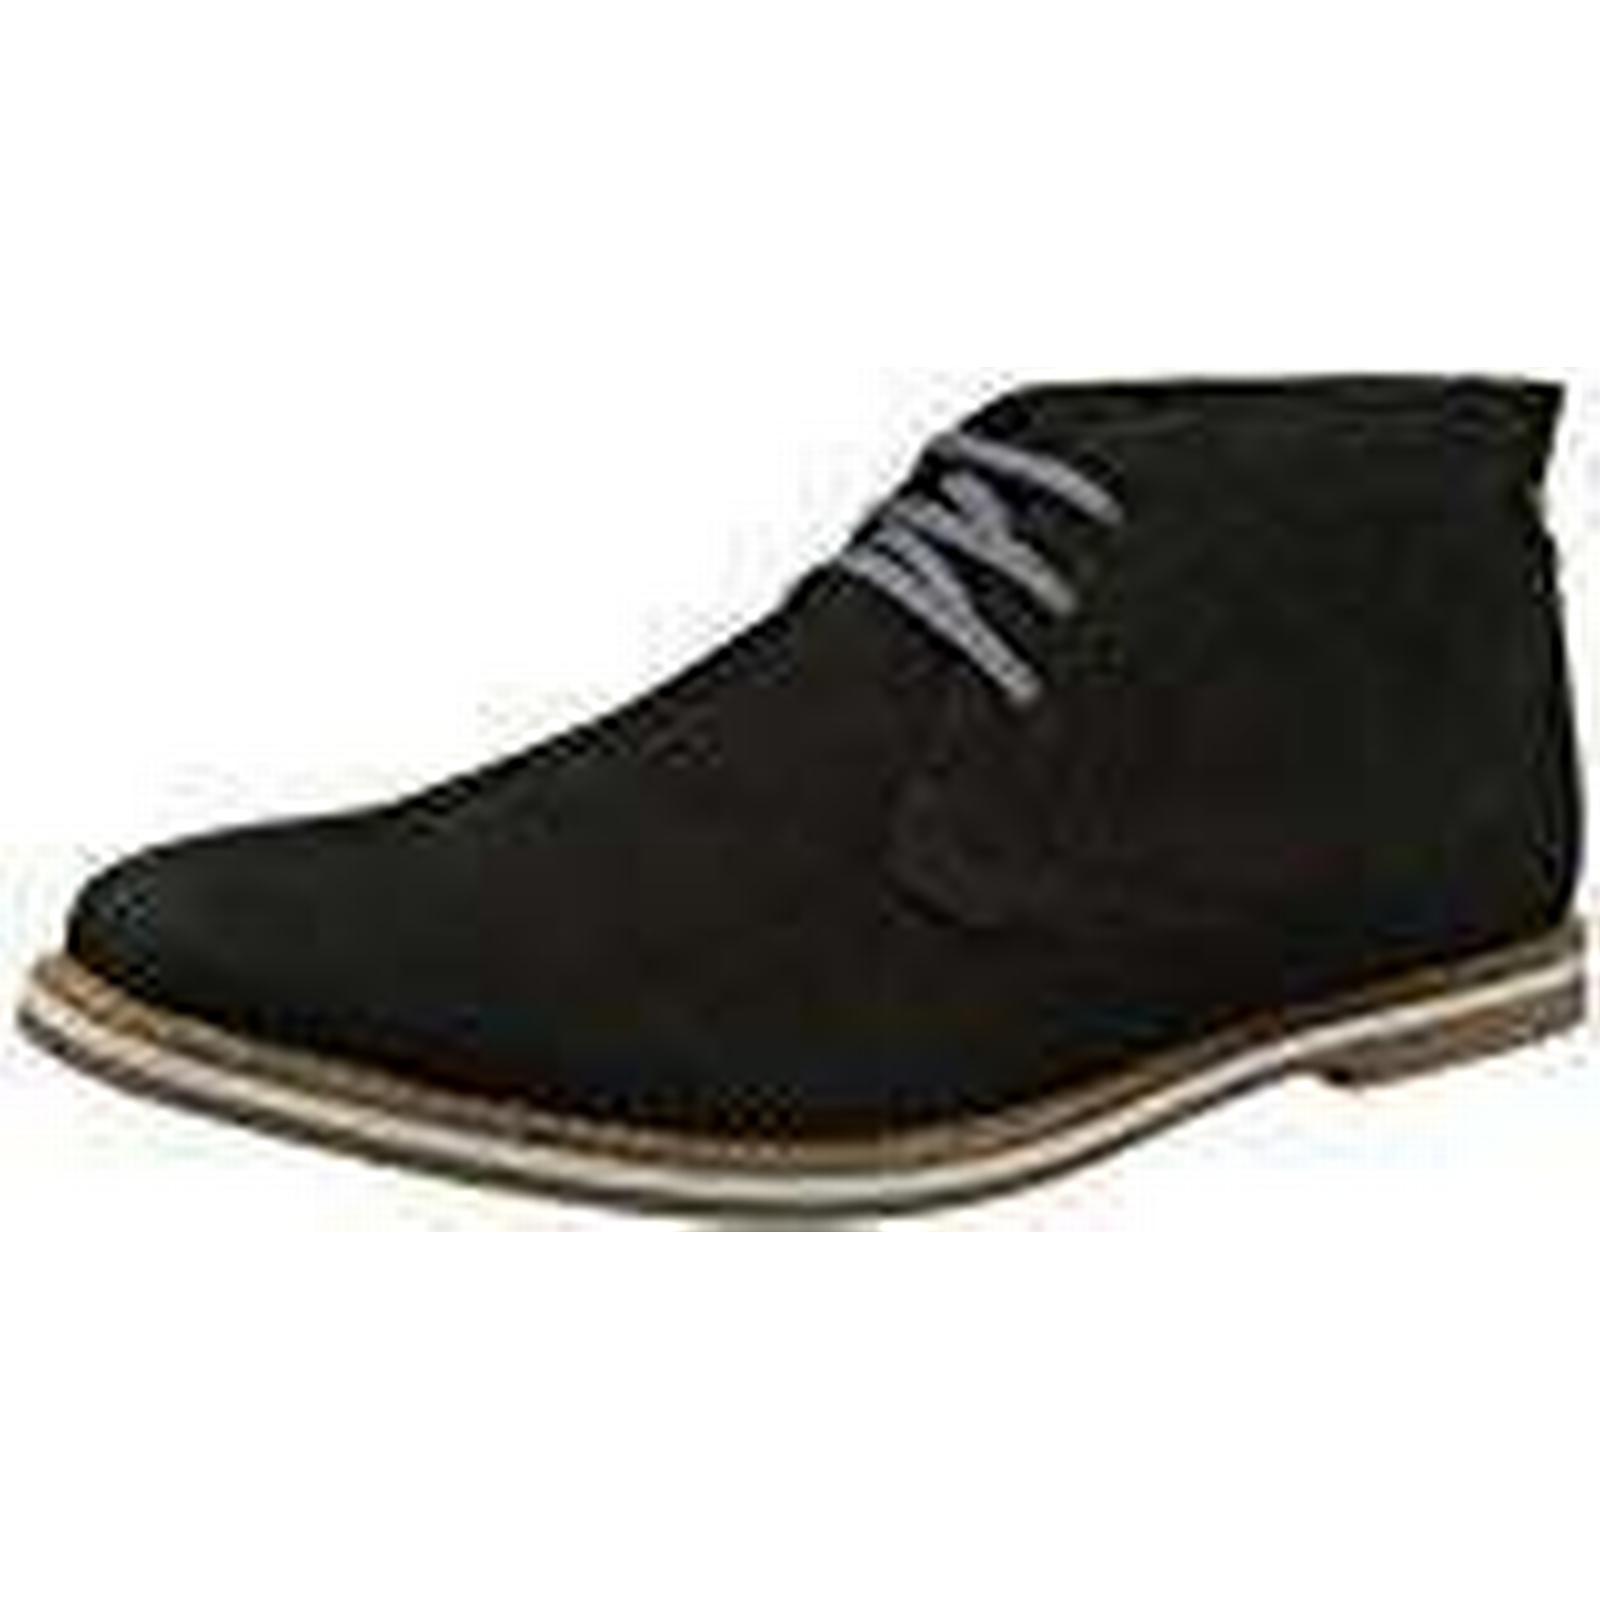 Frank Wright Men's UK Bath Chukka Boots (Black Oxide), 8 UK Men's 42 EU a07dce